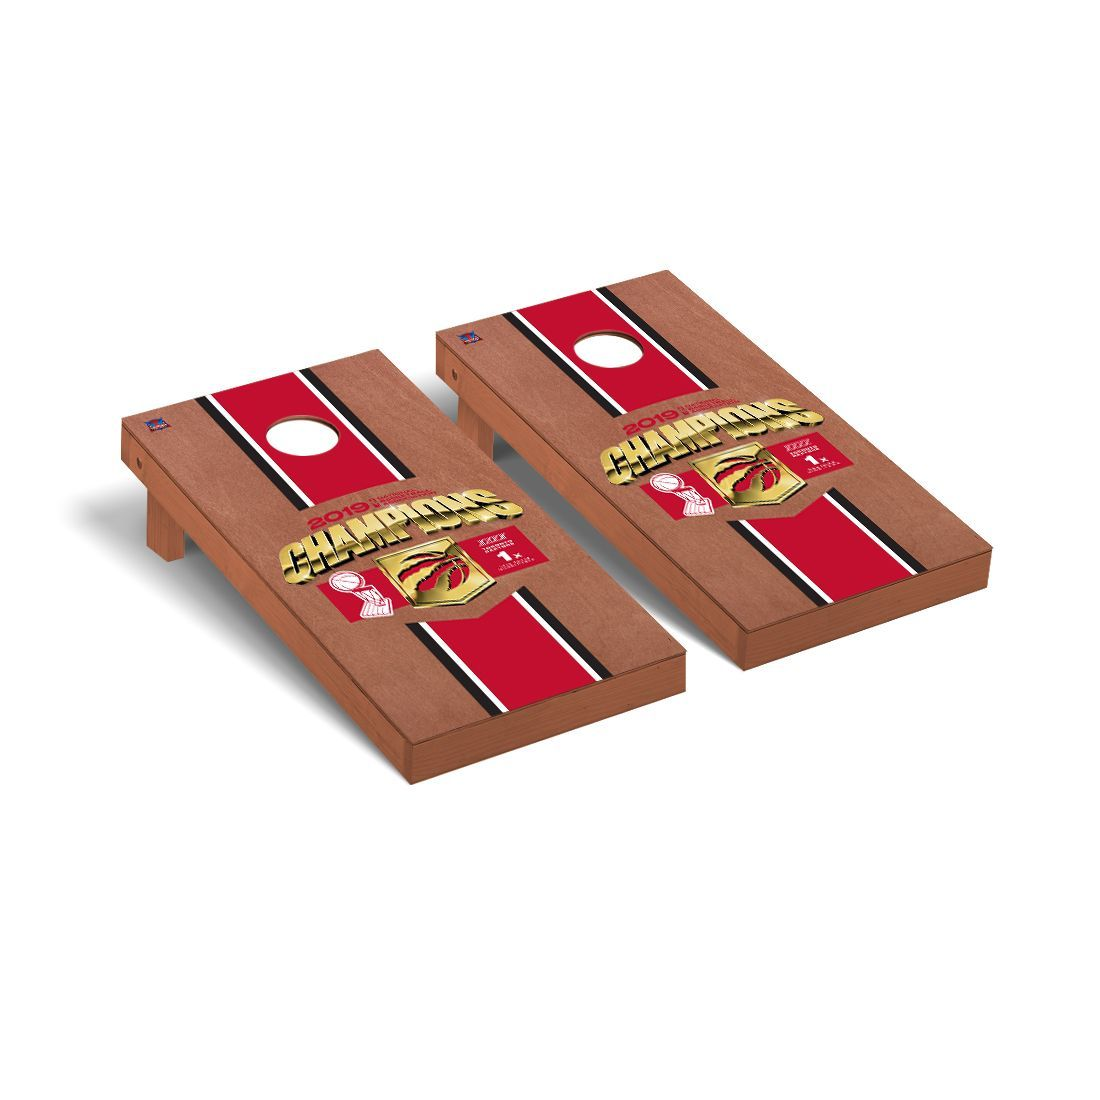 Toronto Raptors NBA Champions 2019 Regulation Cornhole Game Set Rosewood Stained Stripe Version